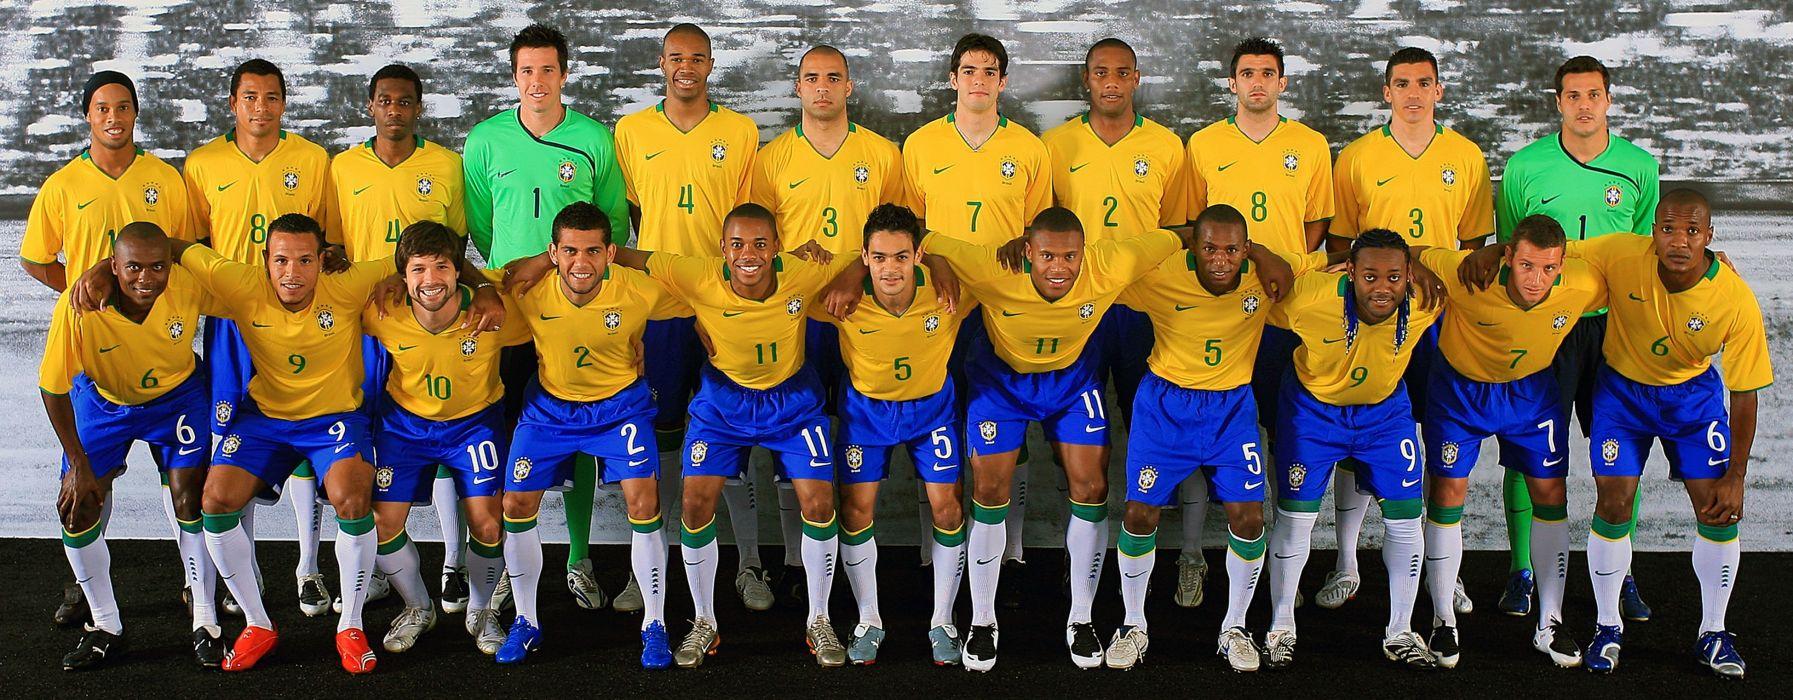 FIFA WORLD CUP Brazil soccer (68) wallpaper